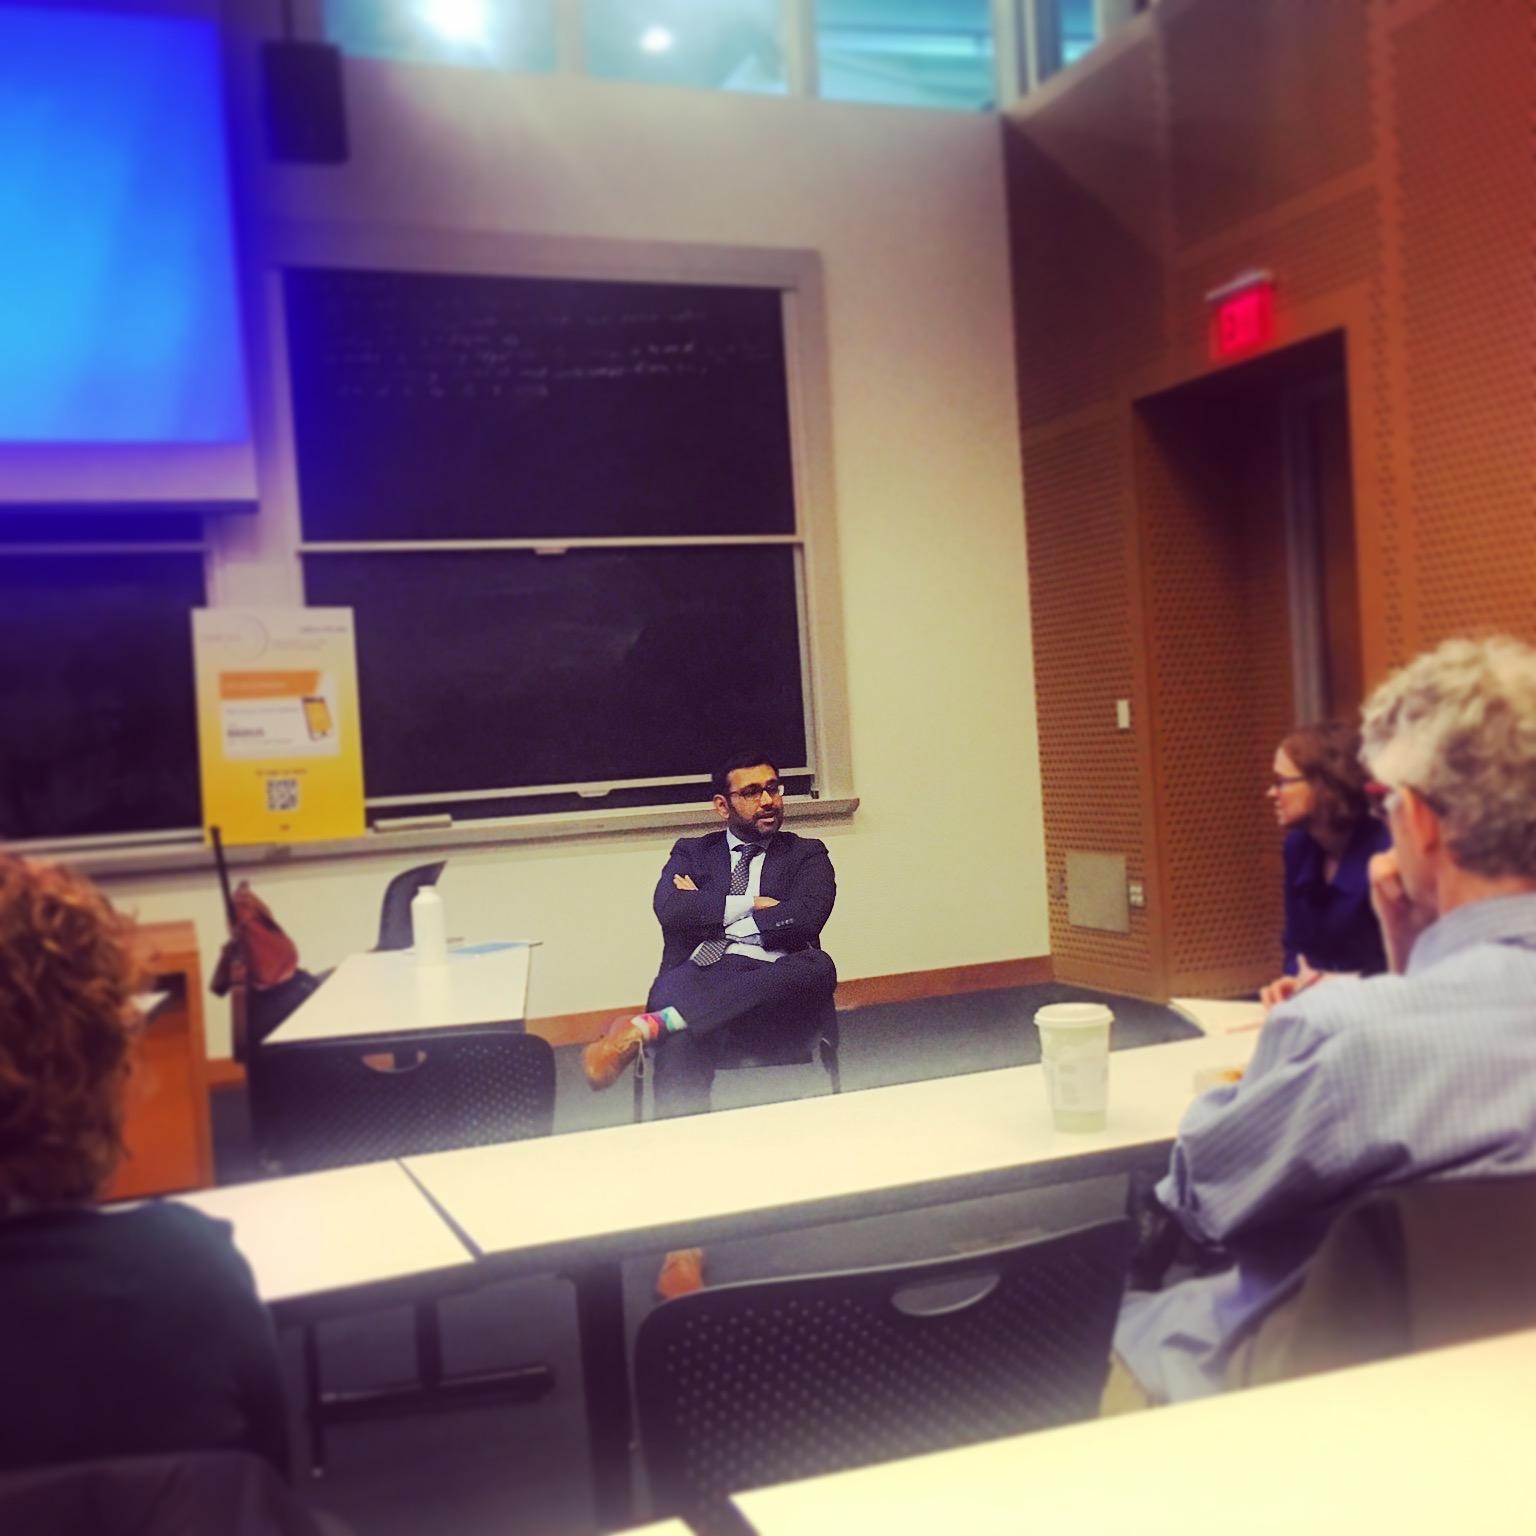 May 1, 2017  Massachusetts Institute of Technology (MIT)  Cambridge, MA